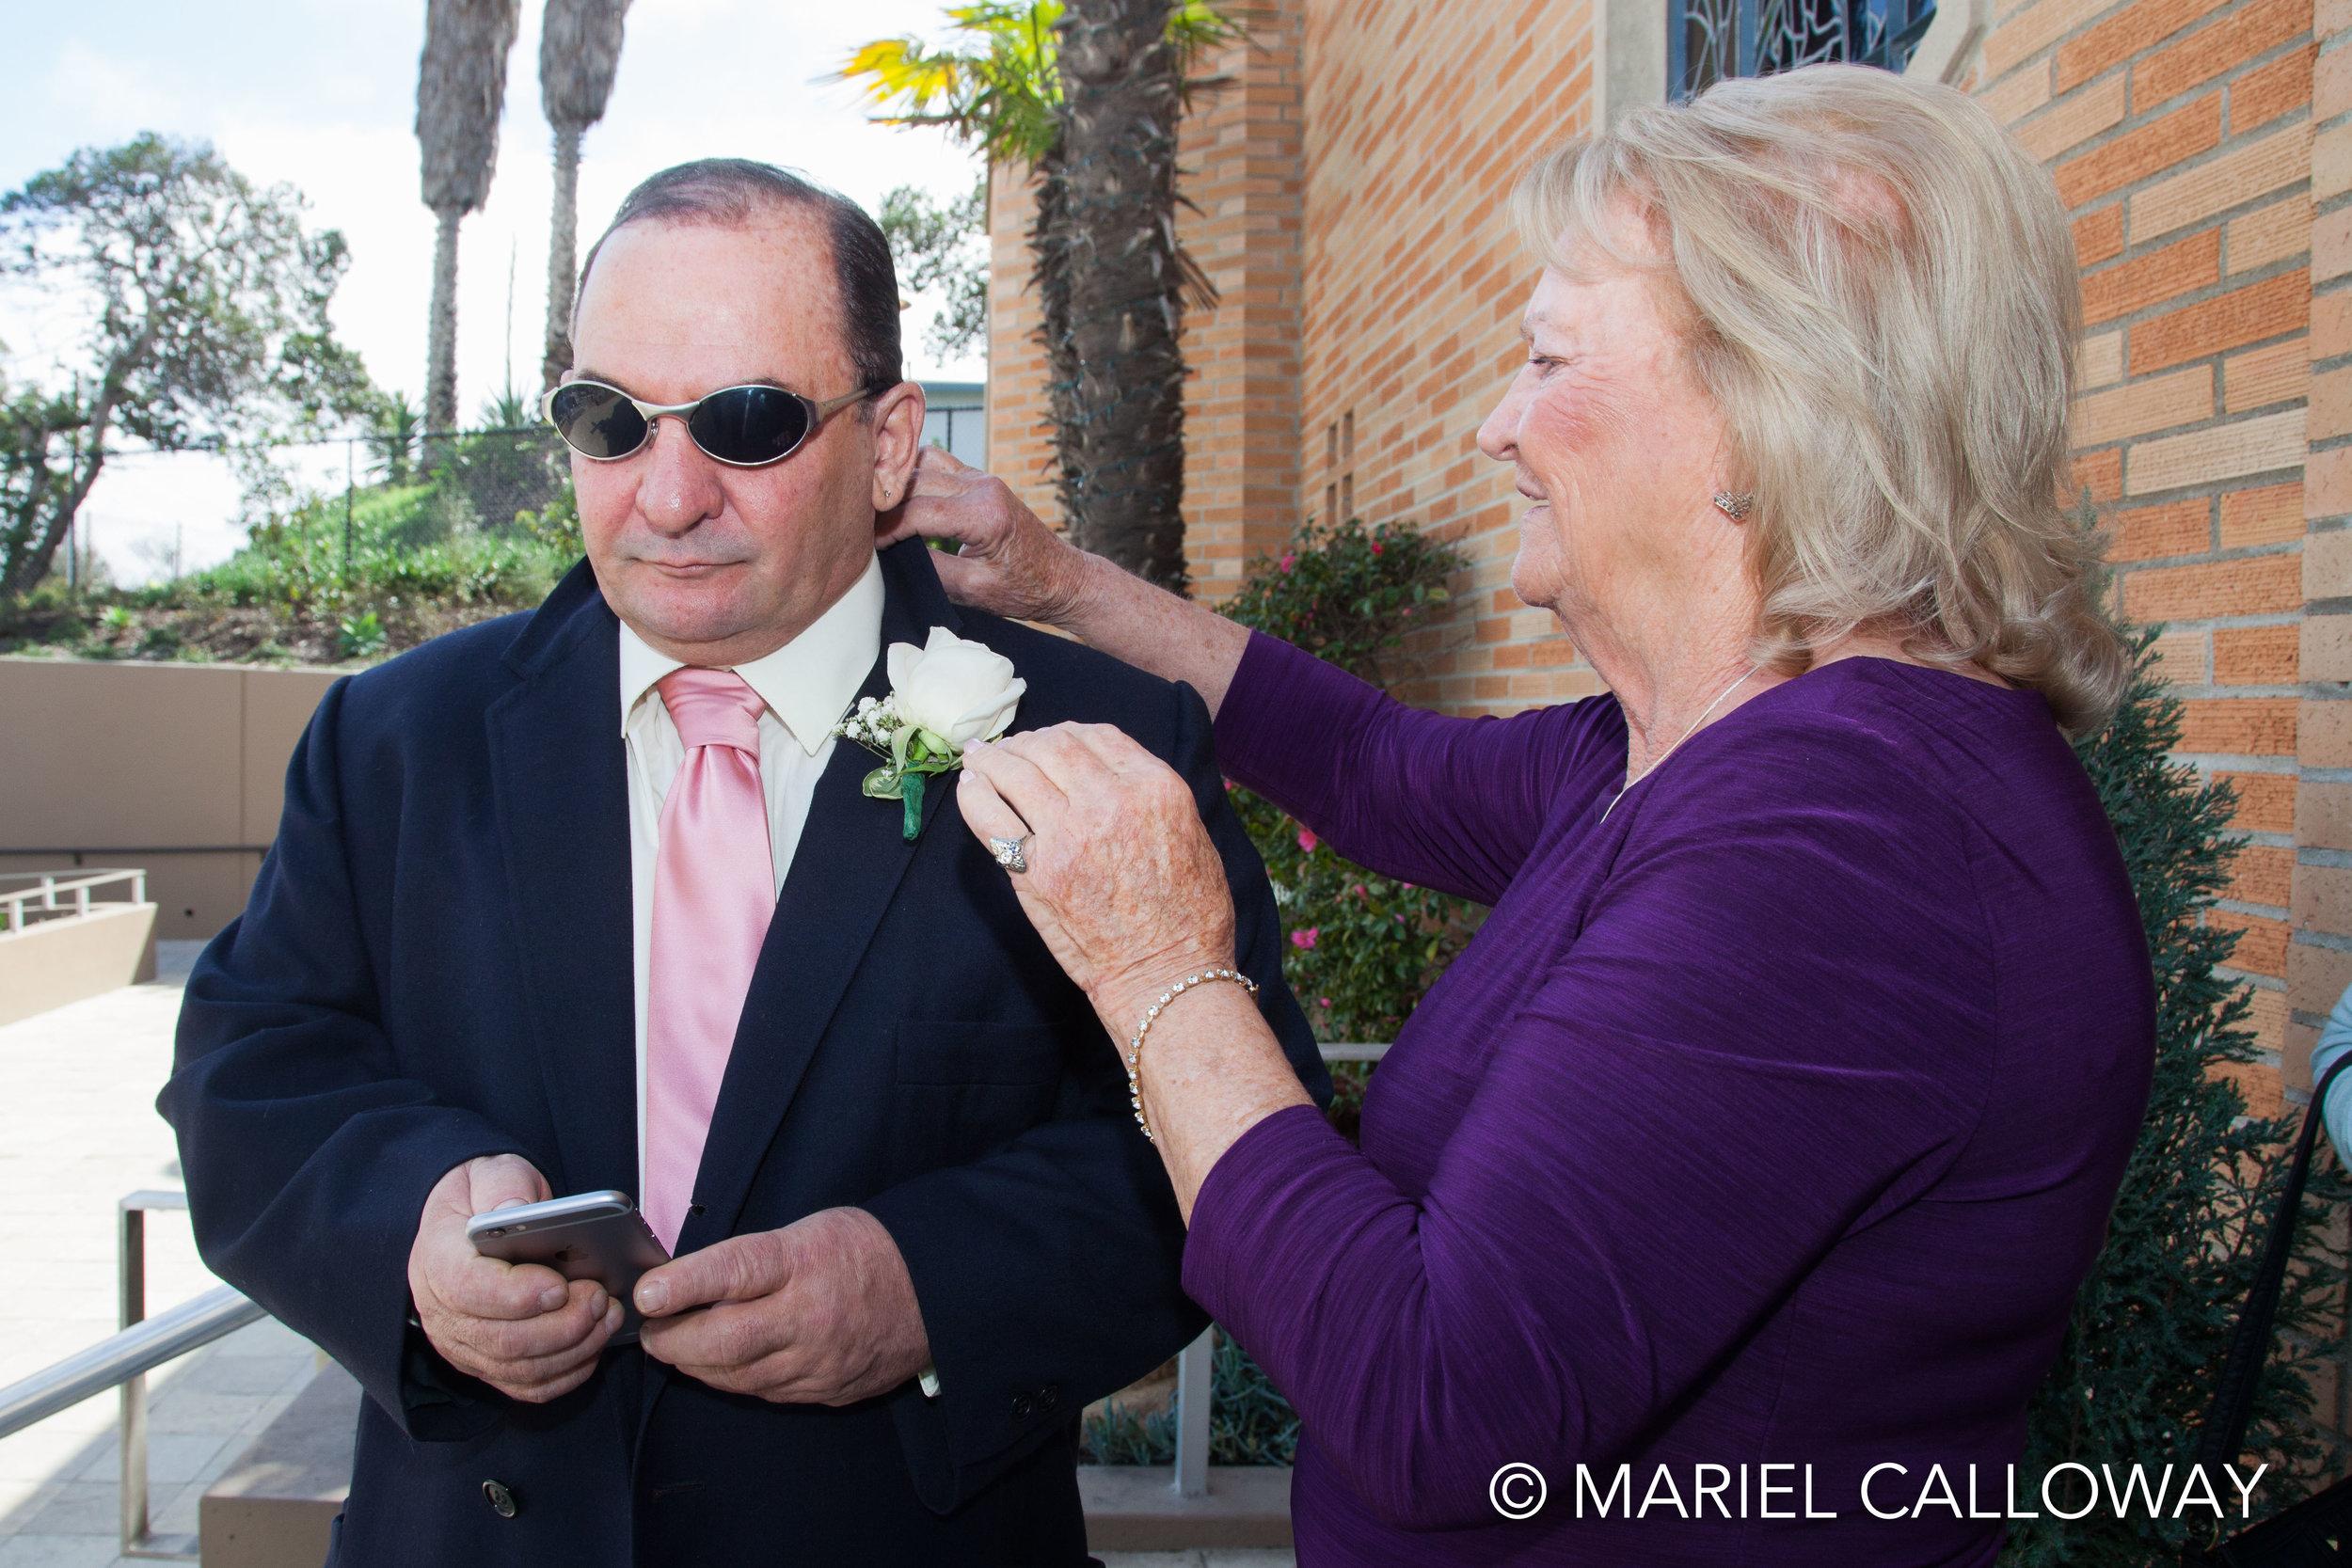 Mariel-Calloway-Los-Angeles-Wedding-Photography-Rossi-36.jpg